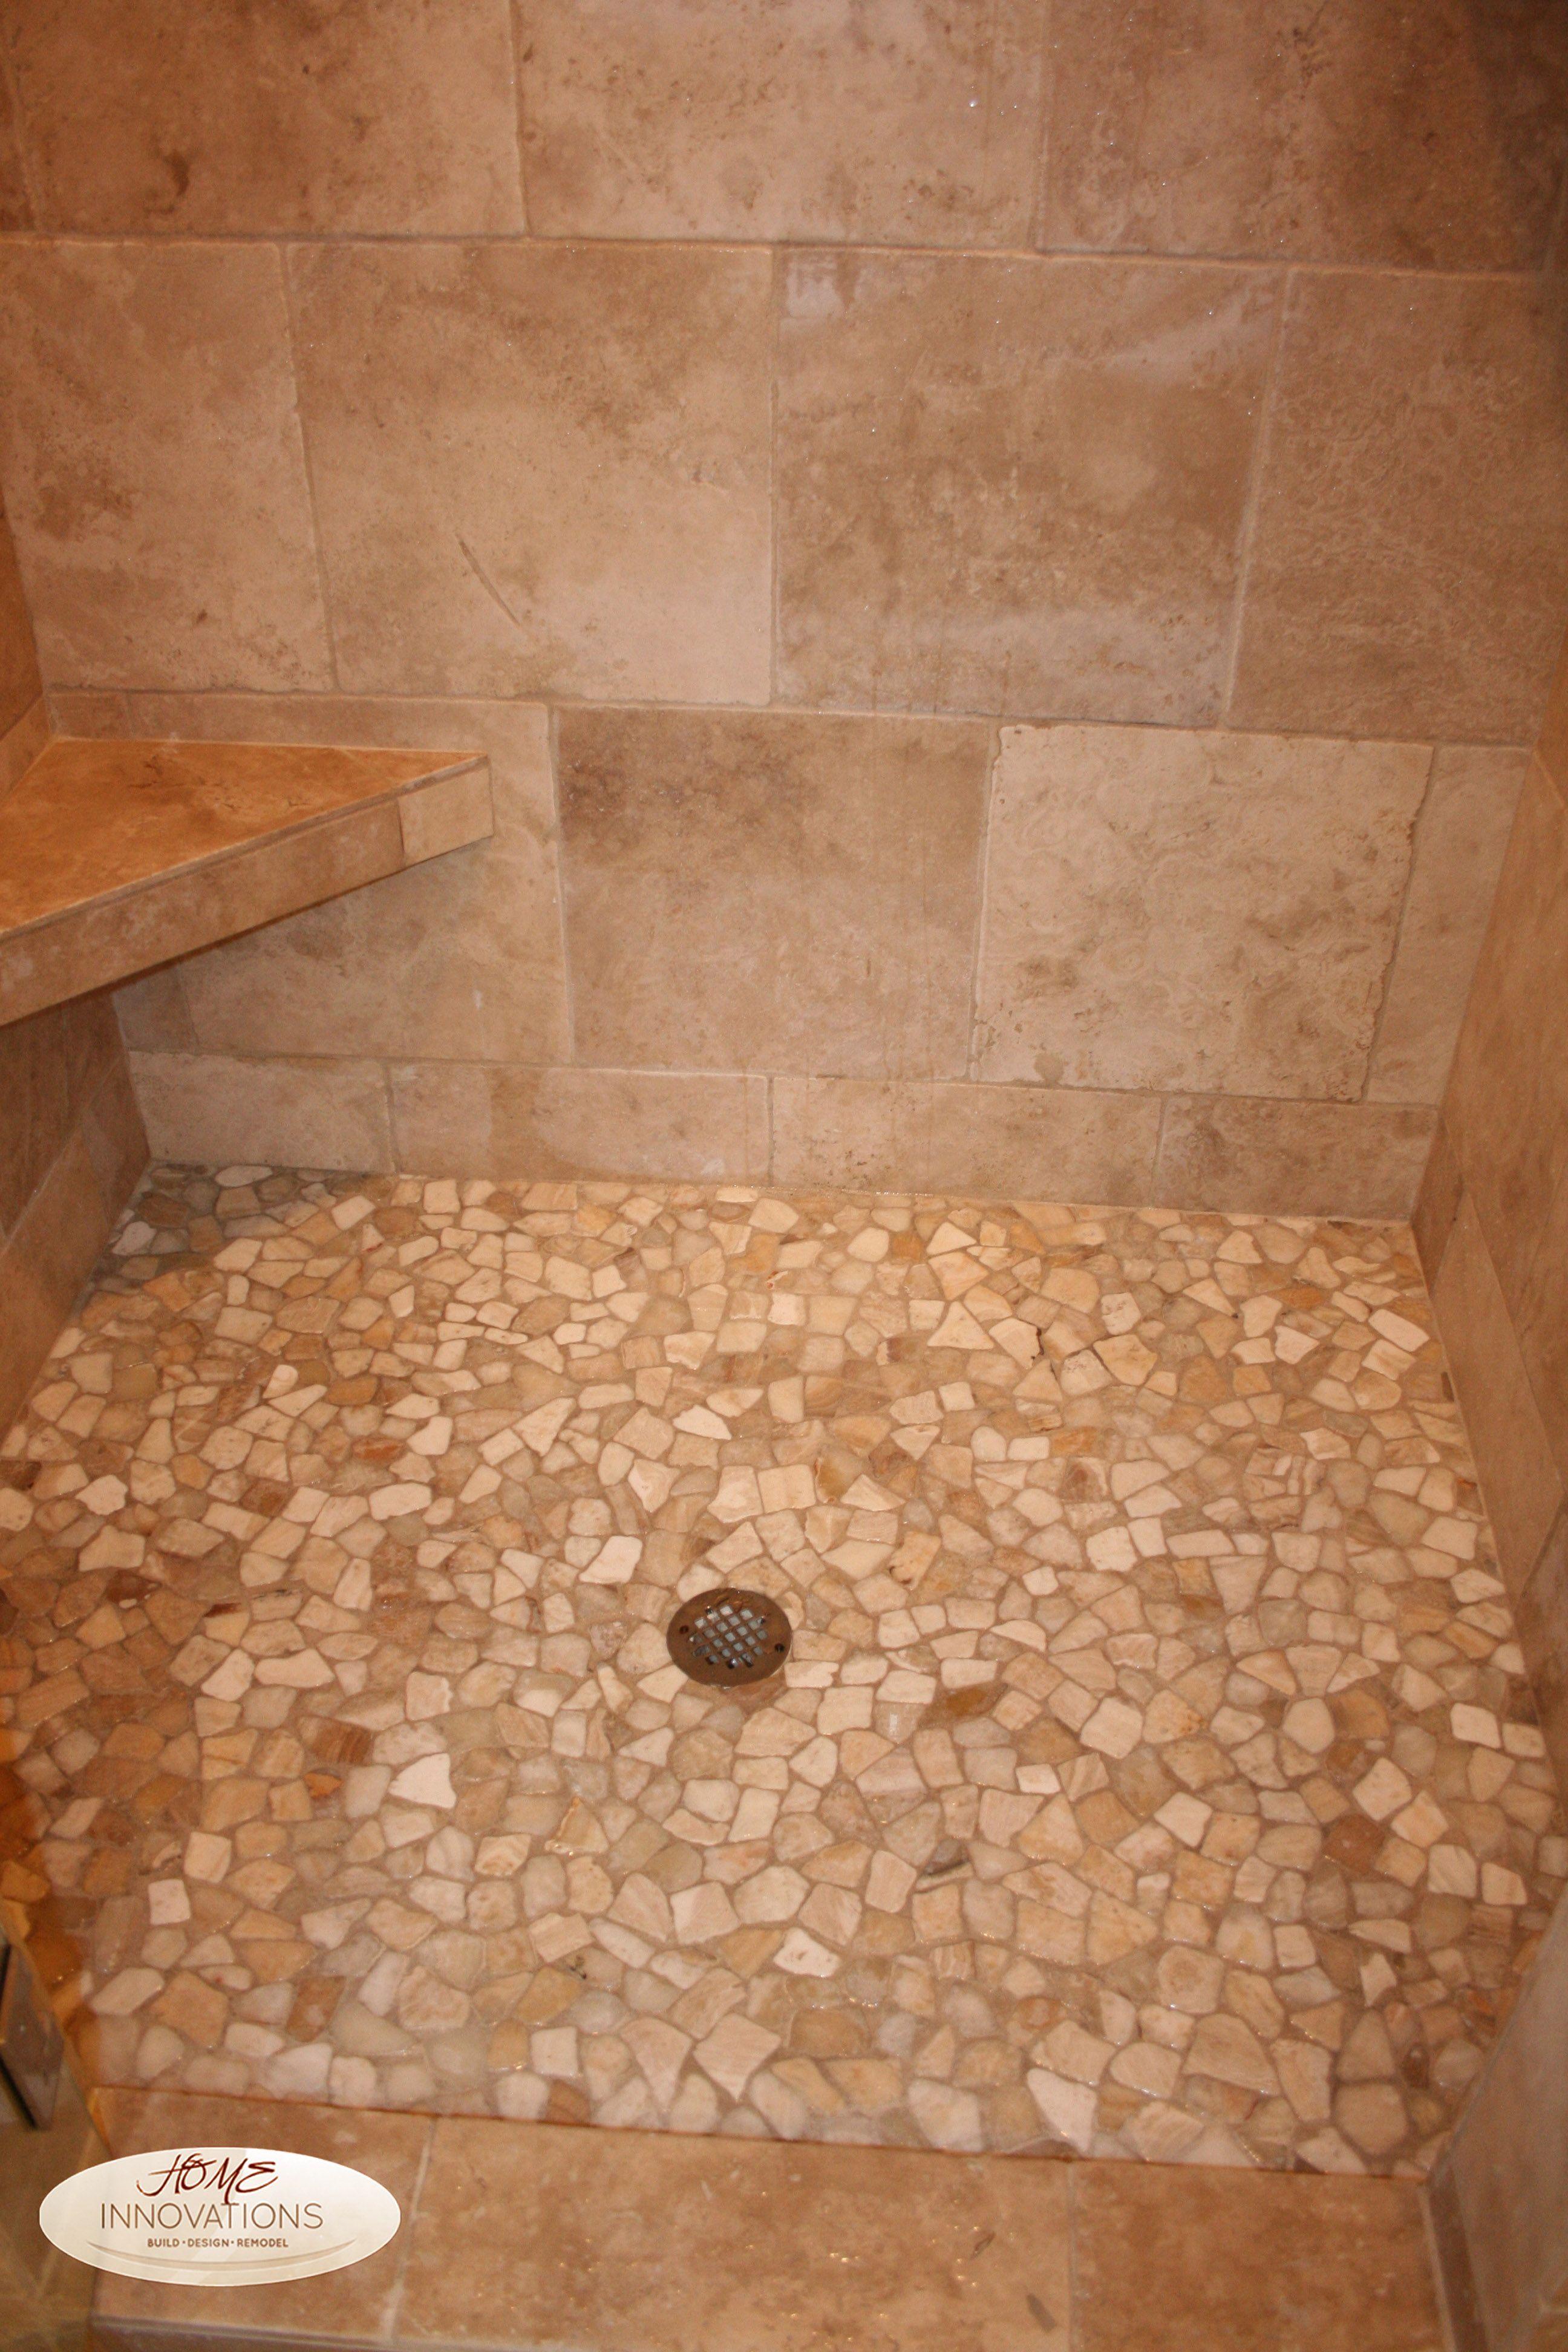 Sandstone Mosaic Tile Shower Tile Travertine Shower Shower